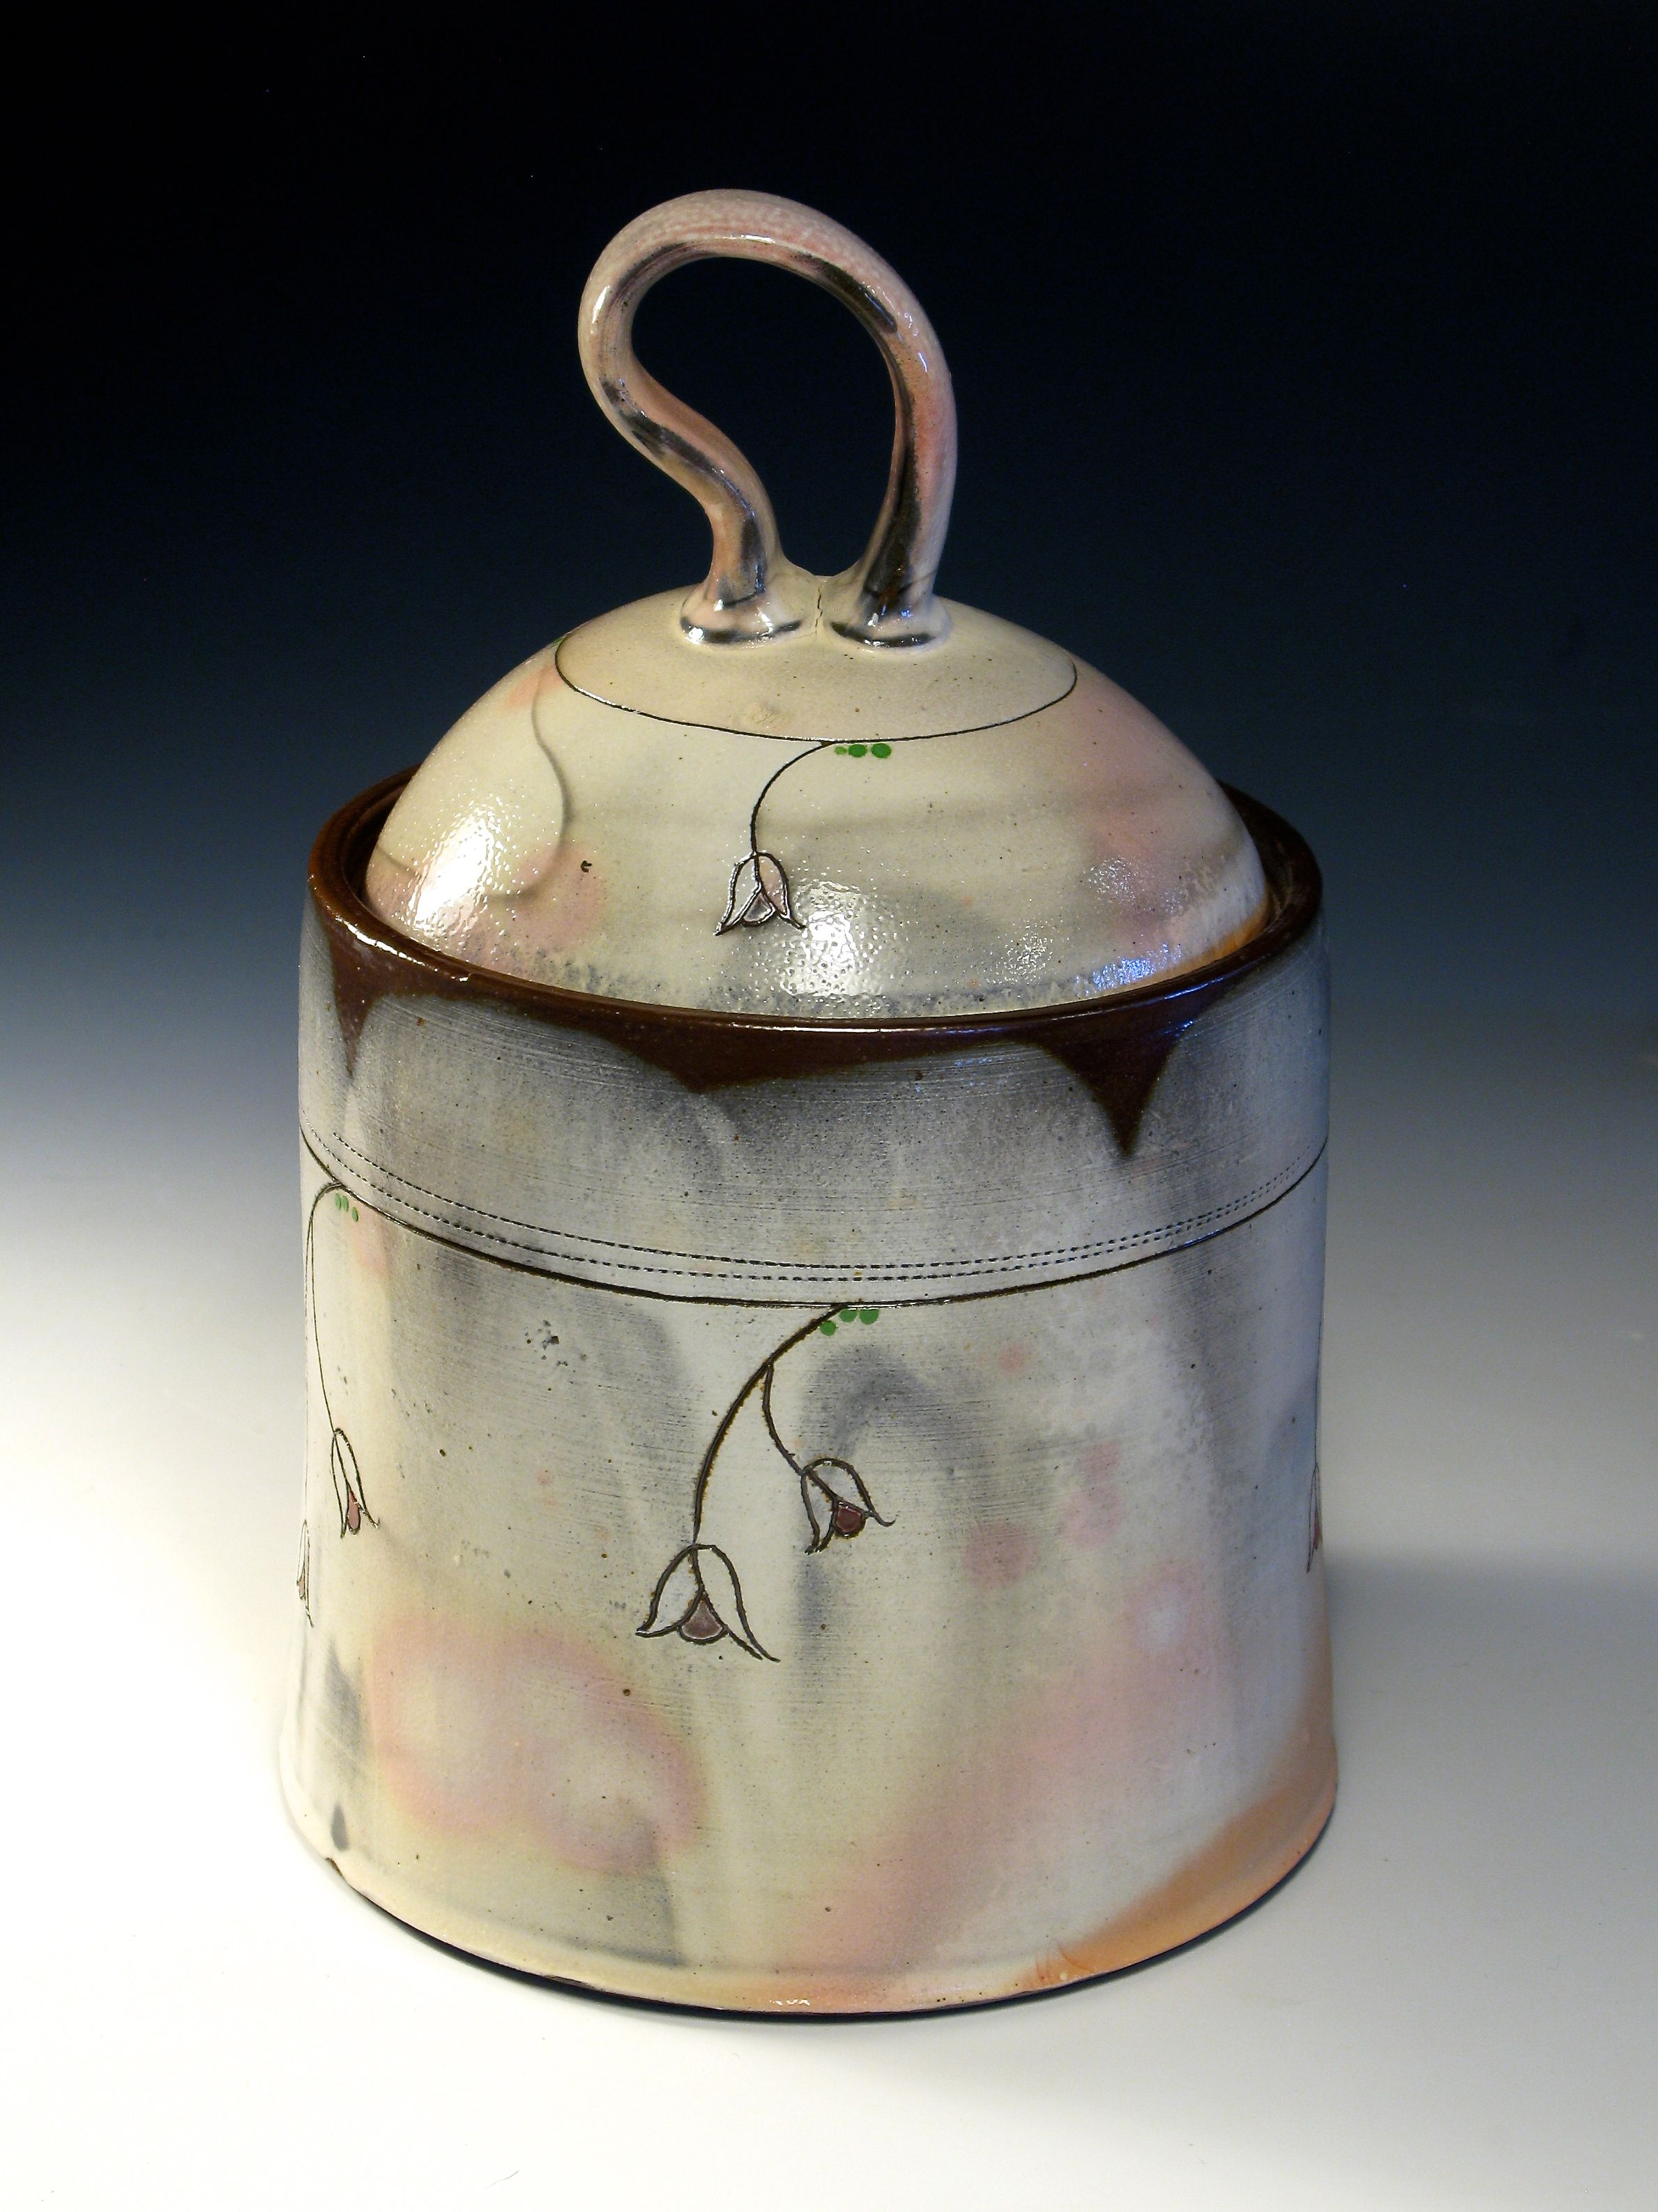 Molly M. Ceramics, cone 5 soda, lidded jar